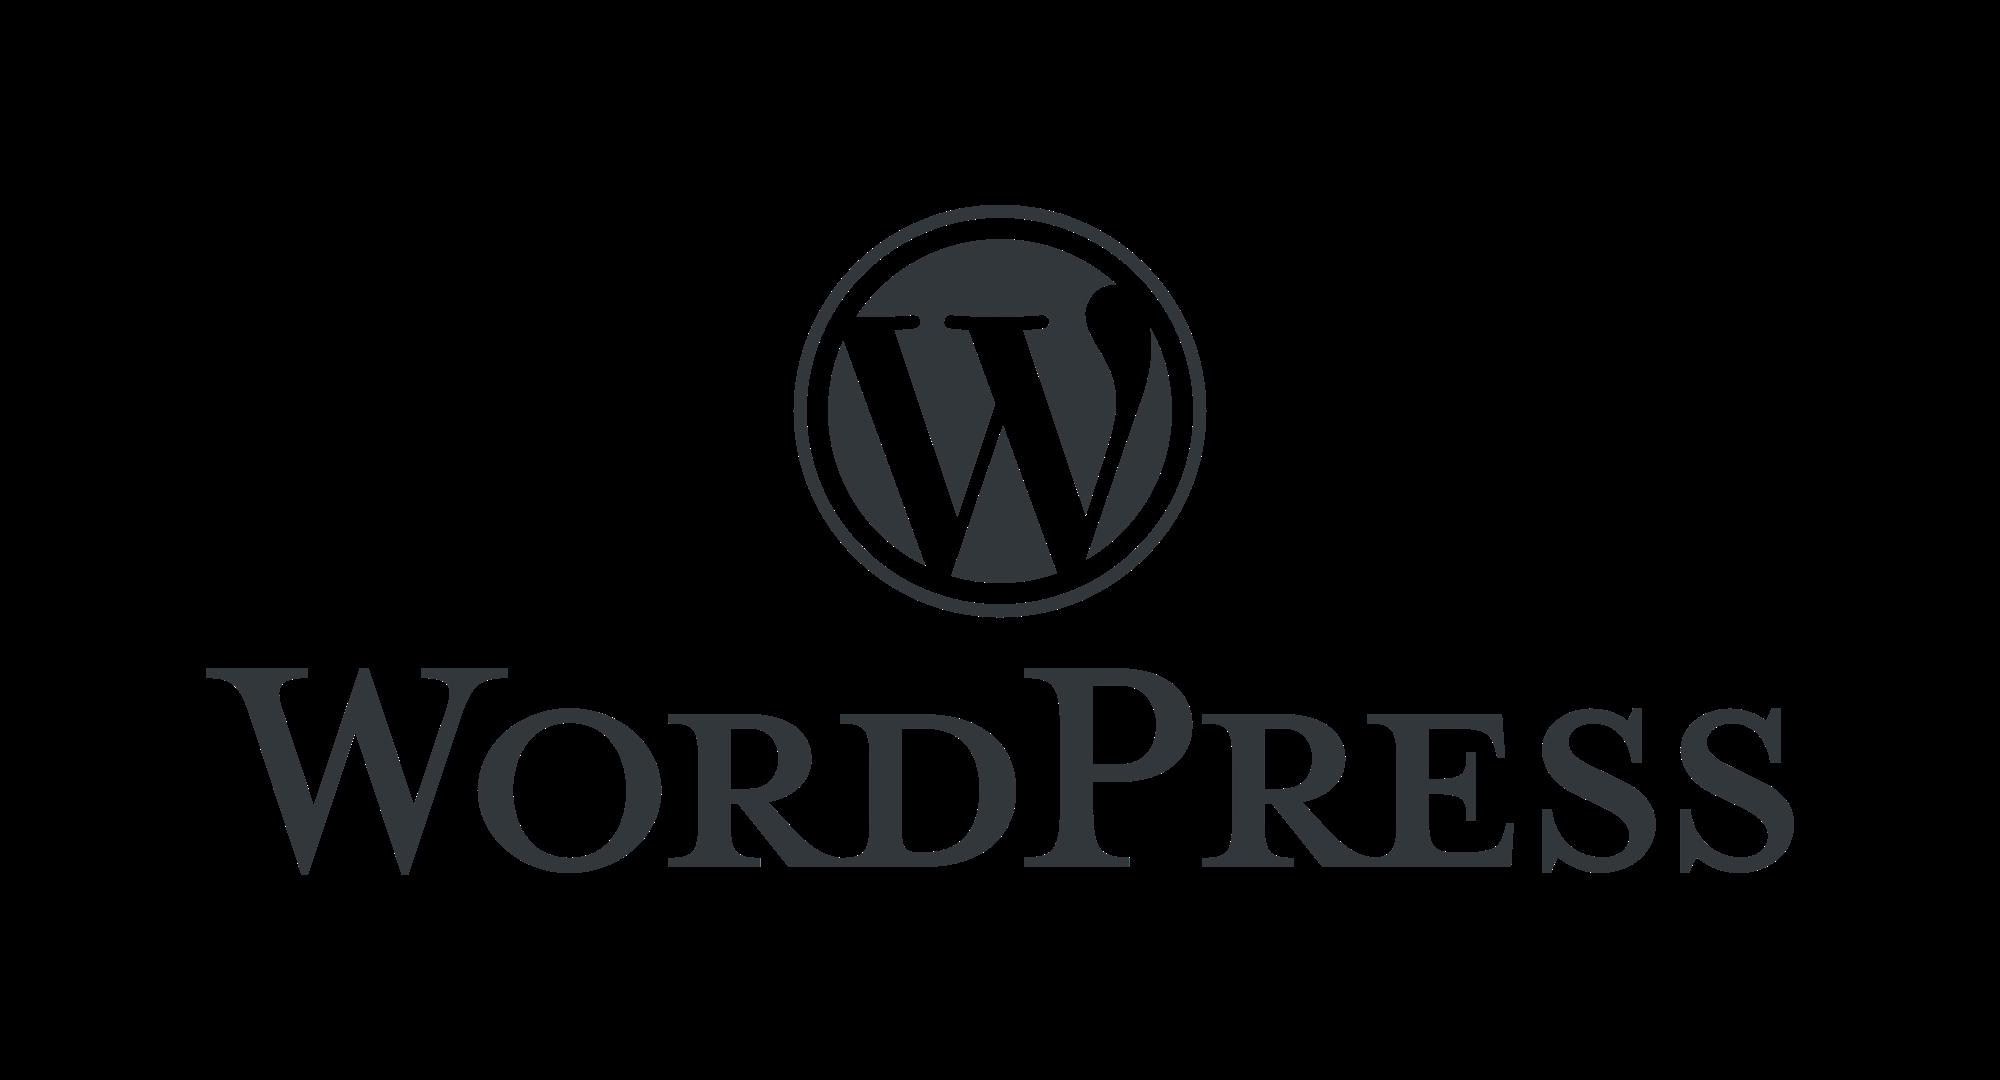 WordPress logotype alternative